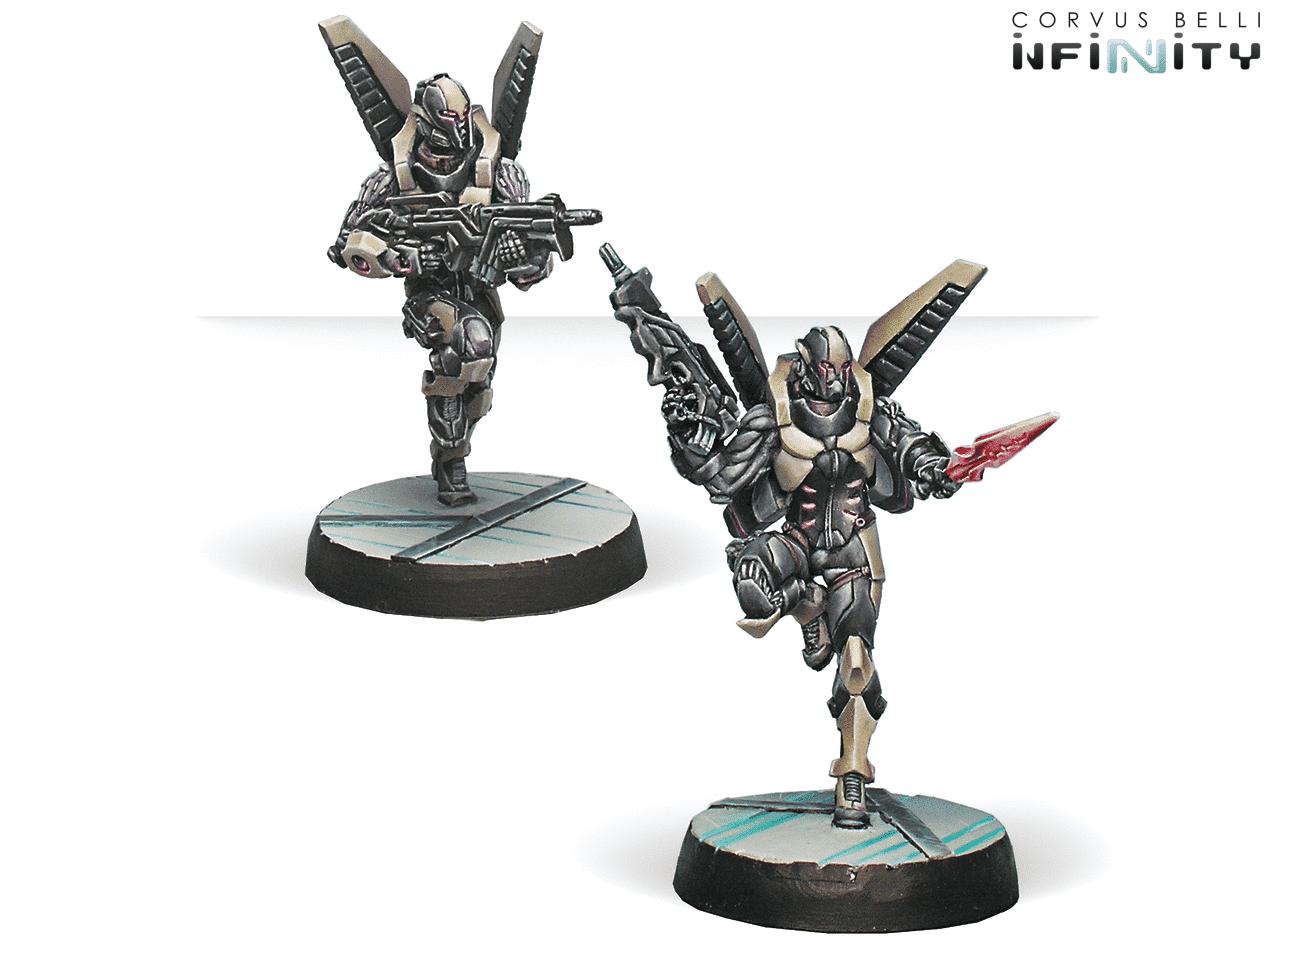 Ekdromoi HMG Infinity Corvus Belli